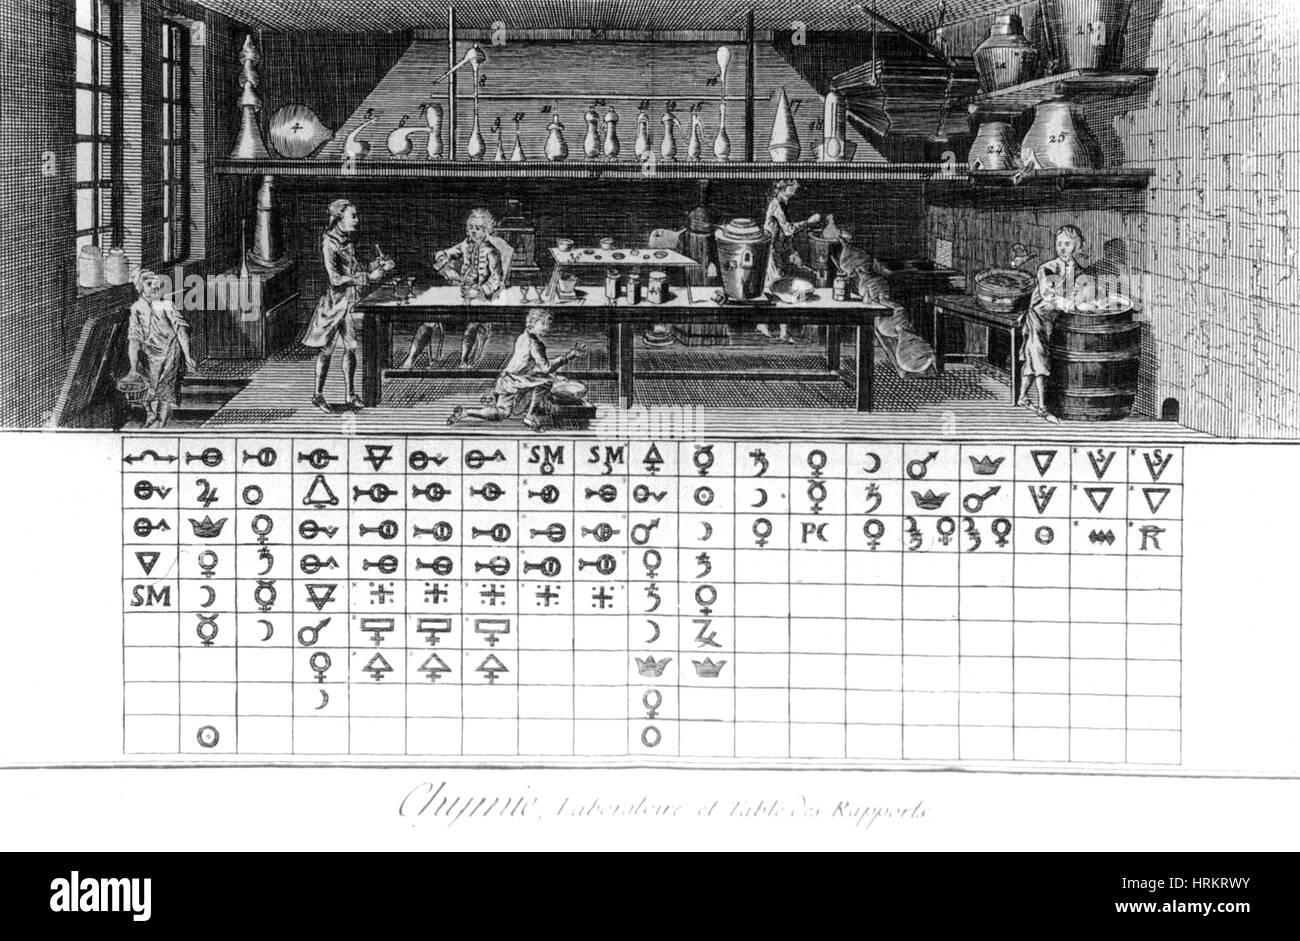 Laboratory and Alchemical Symbols, 18th Century - Stock Image